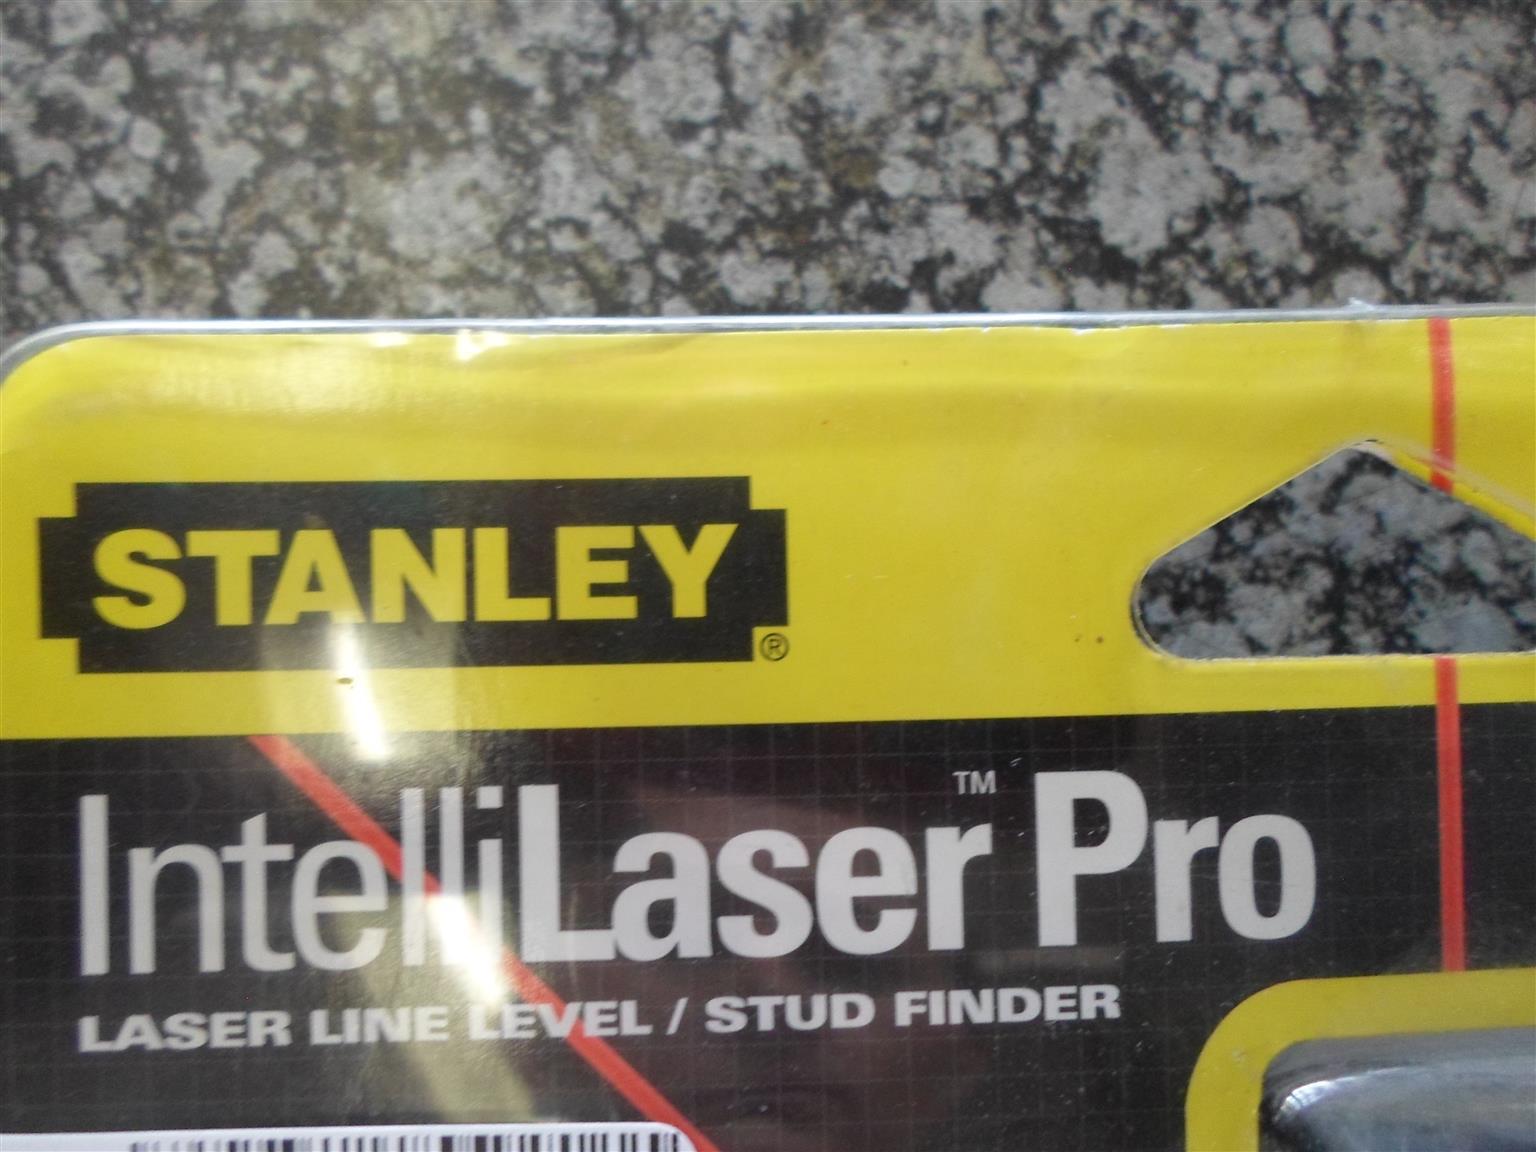 Stanley Intelli Laser Pro laser Line Level